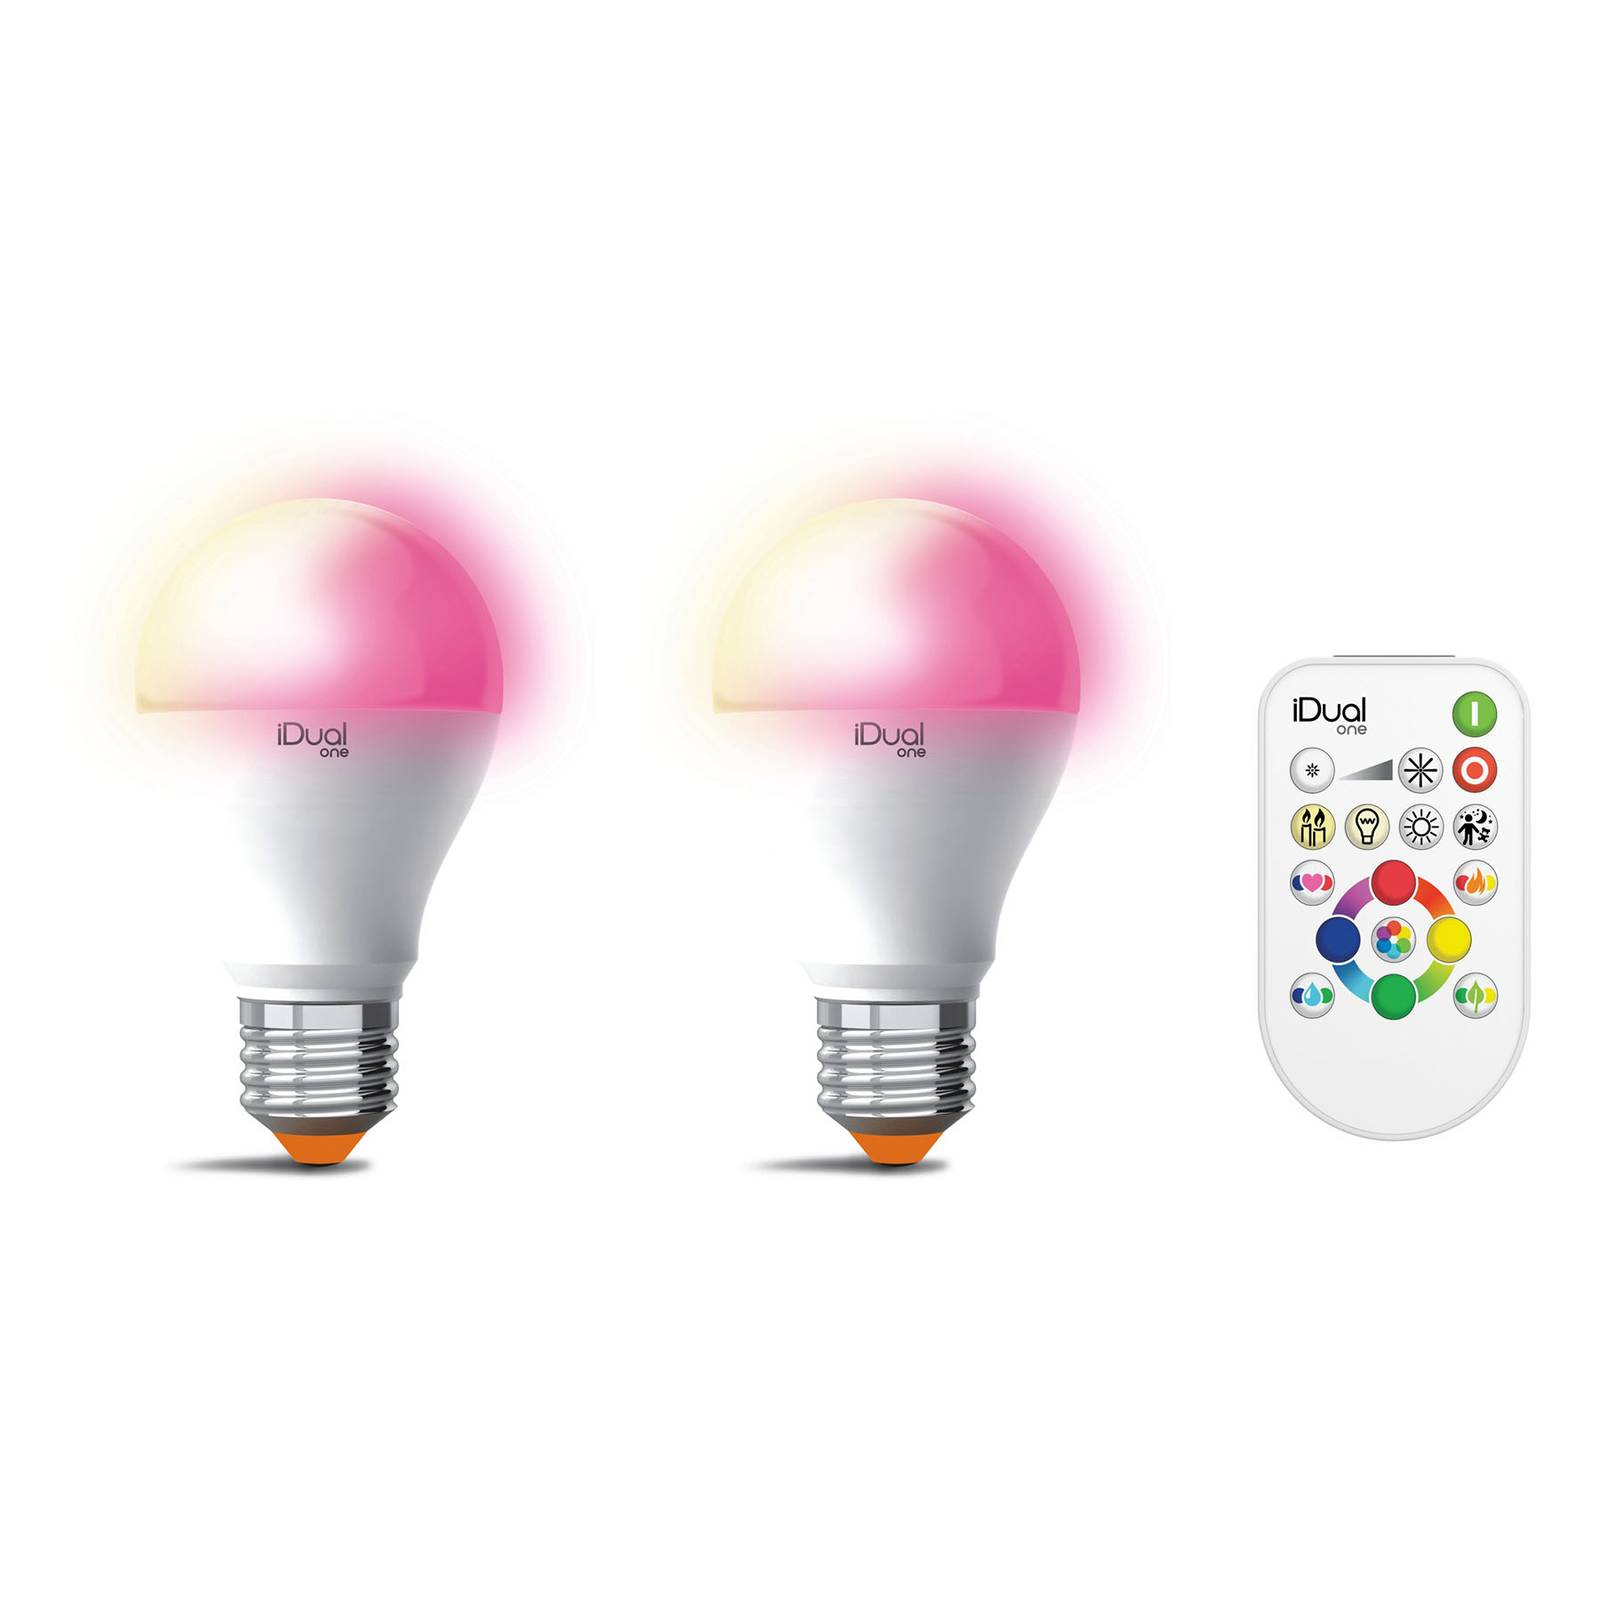 iDual One E27 A60 9,5W 2 kpl RGBW, kaukosäädin